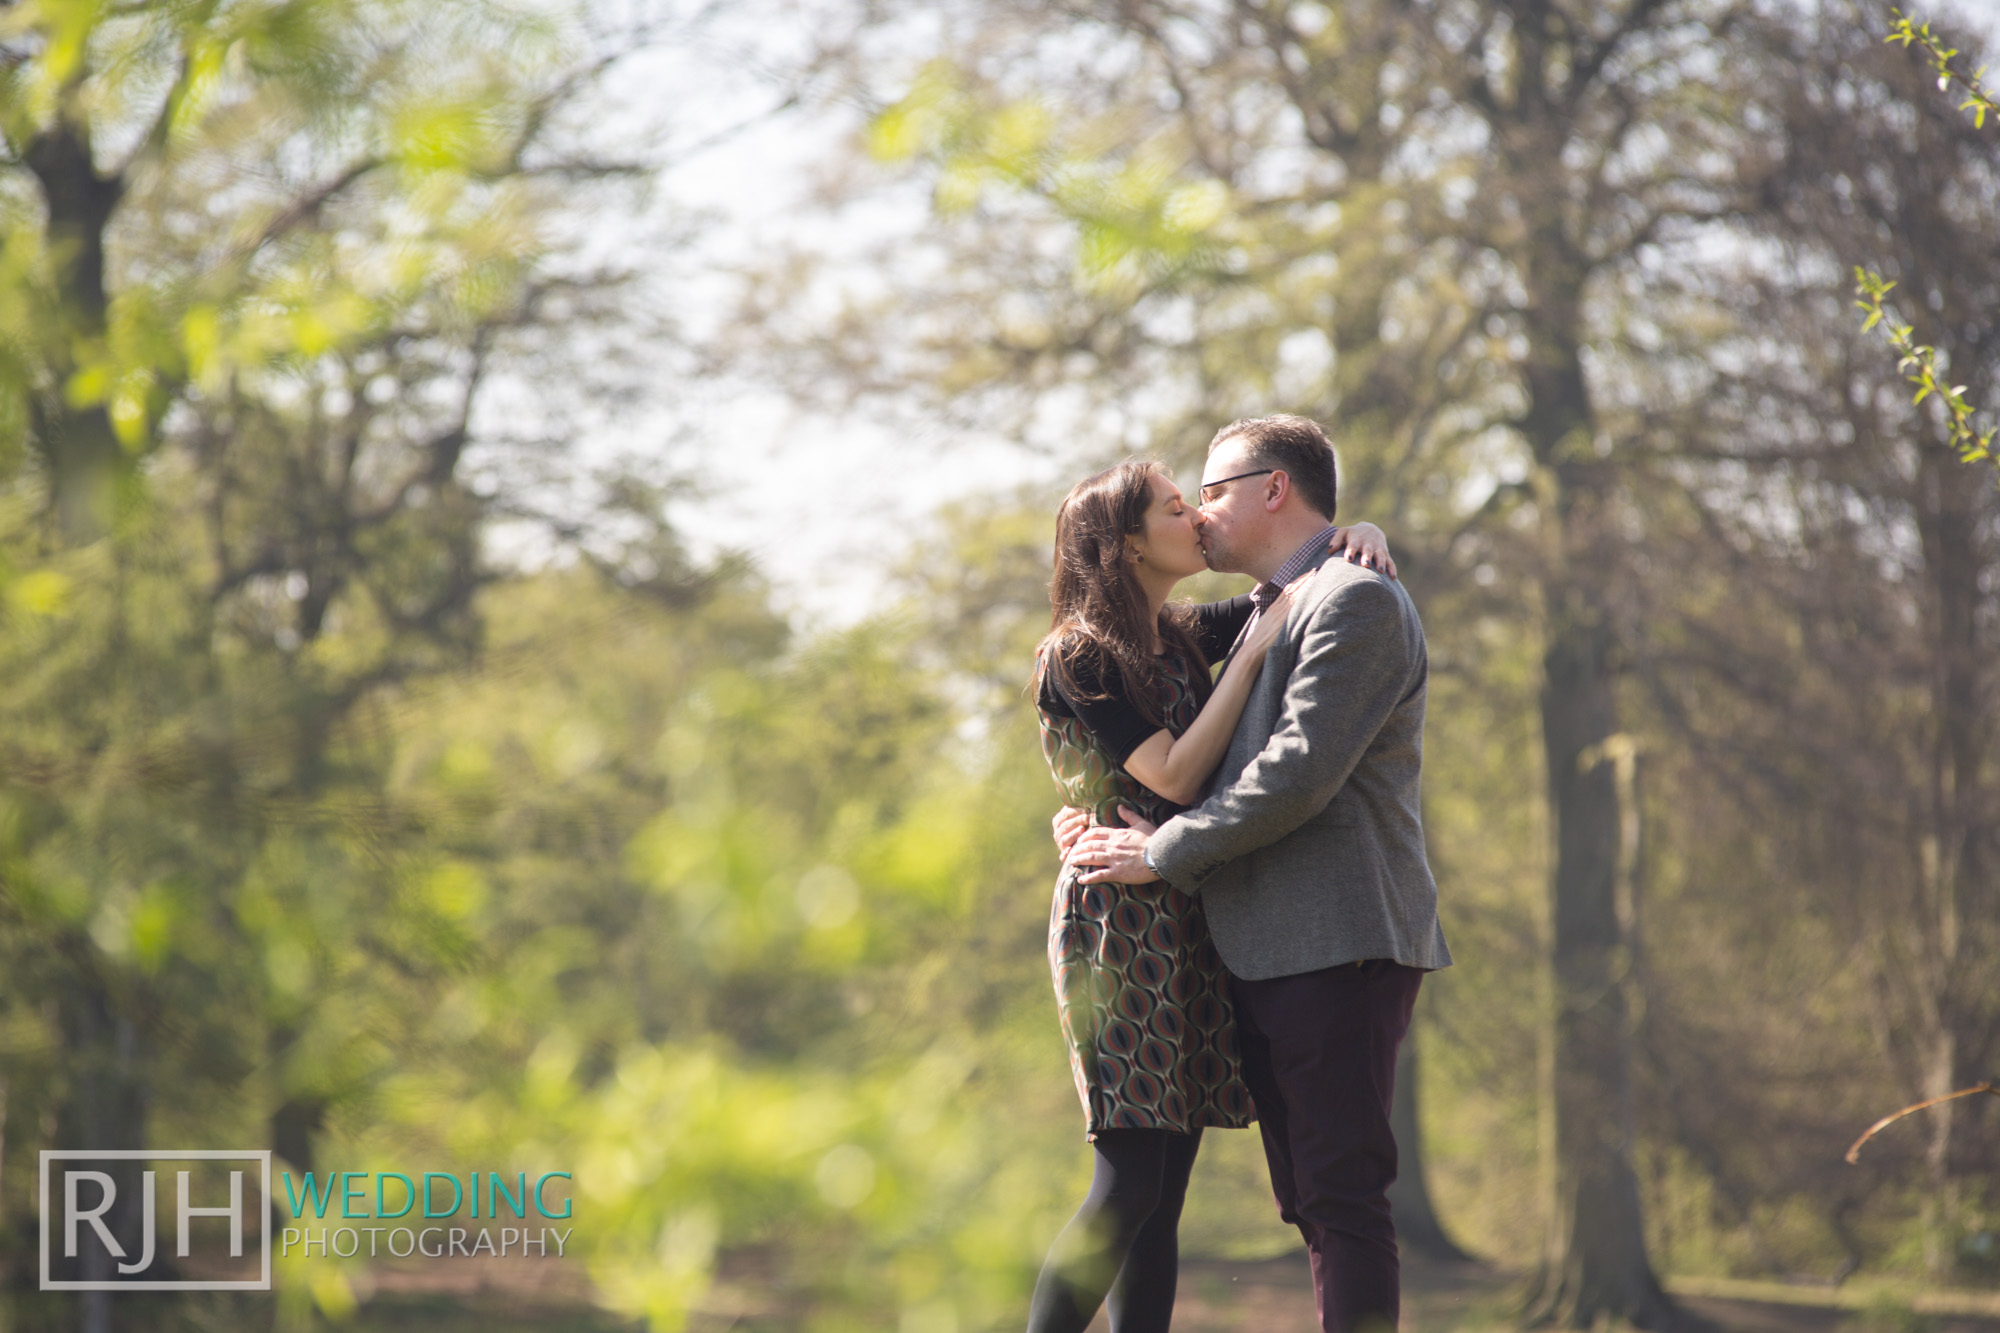 Pre-wedding photography - Richard & Rachel_013_3C2A8186.jpg